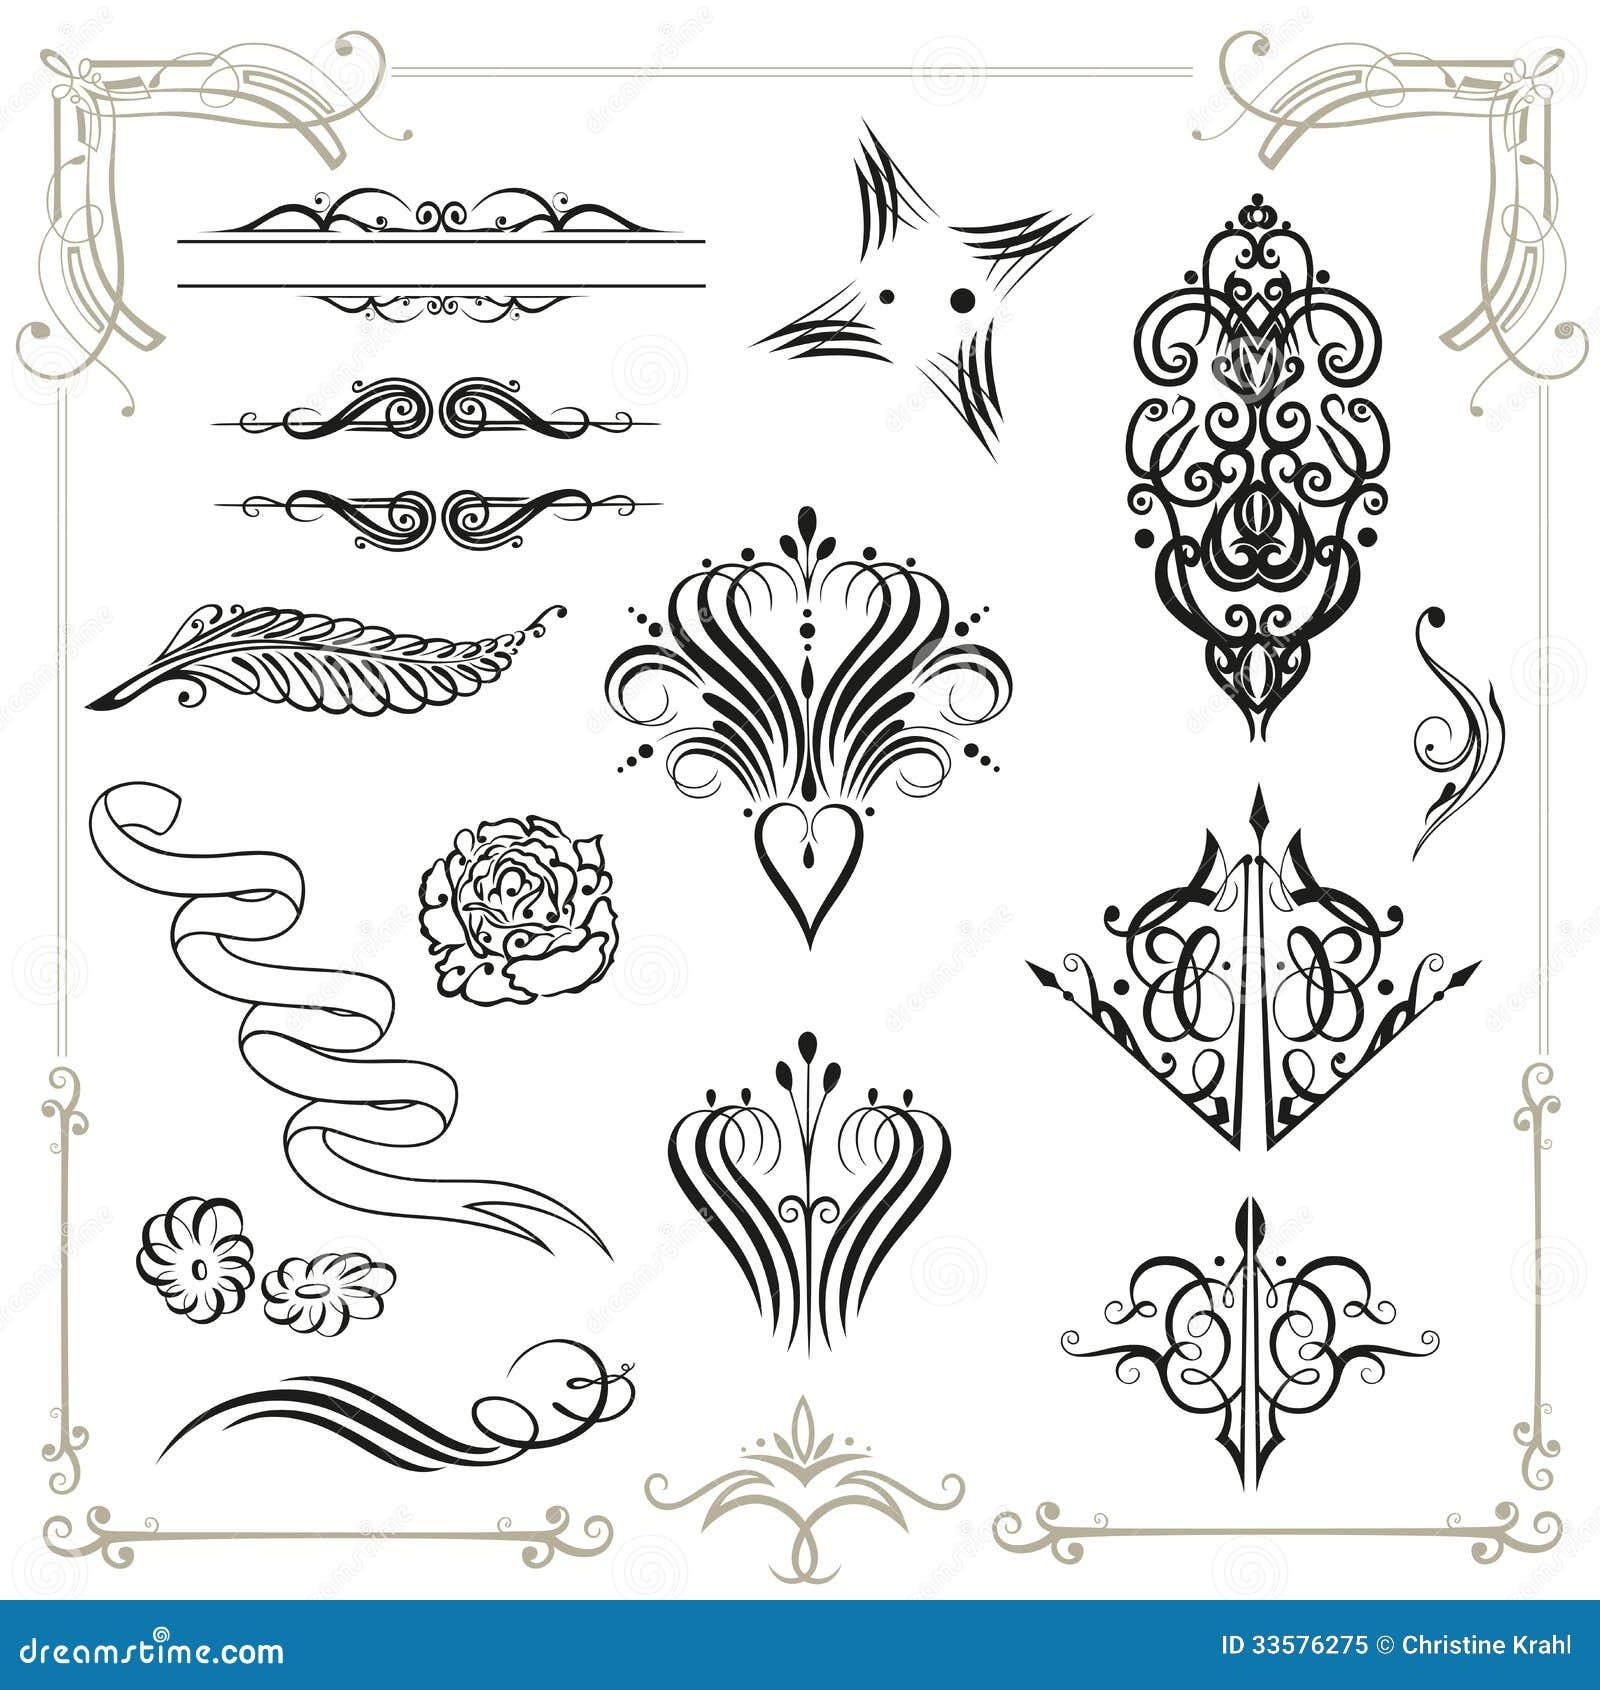 calligraphy decoration royalty free stock photo image